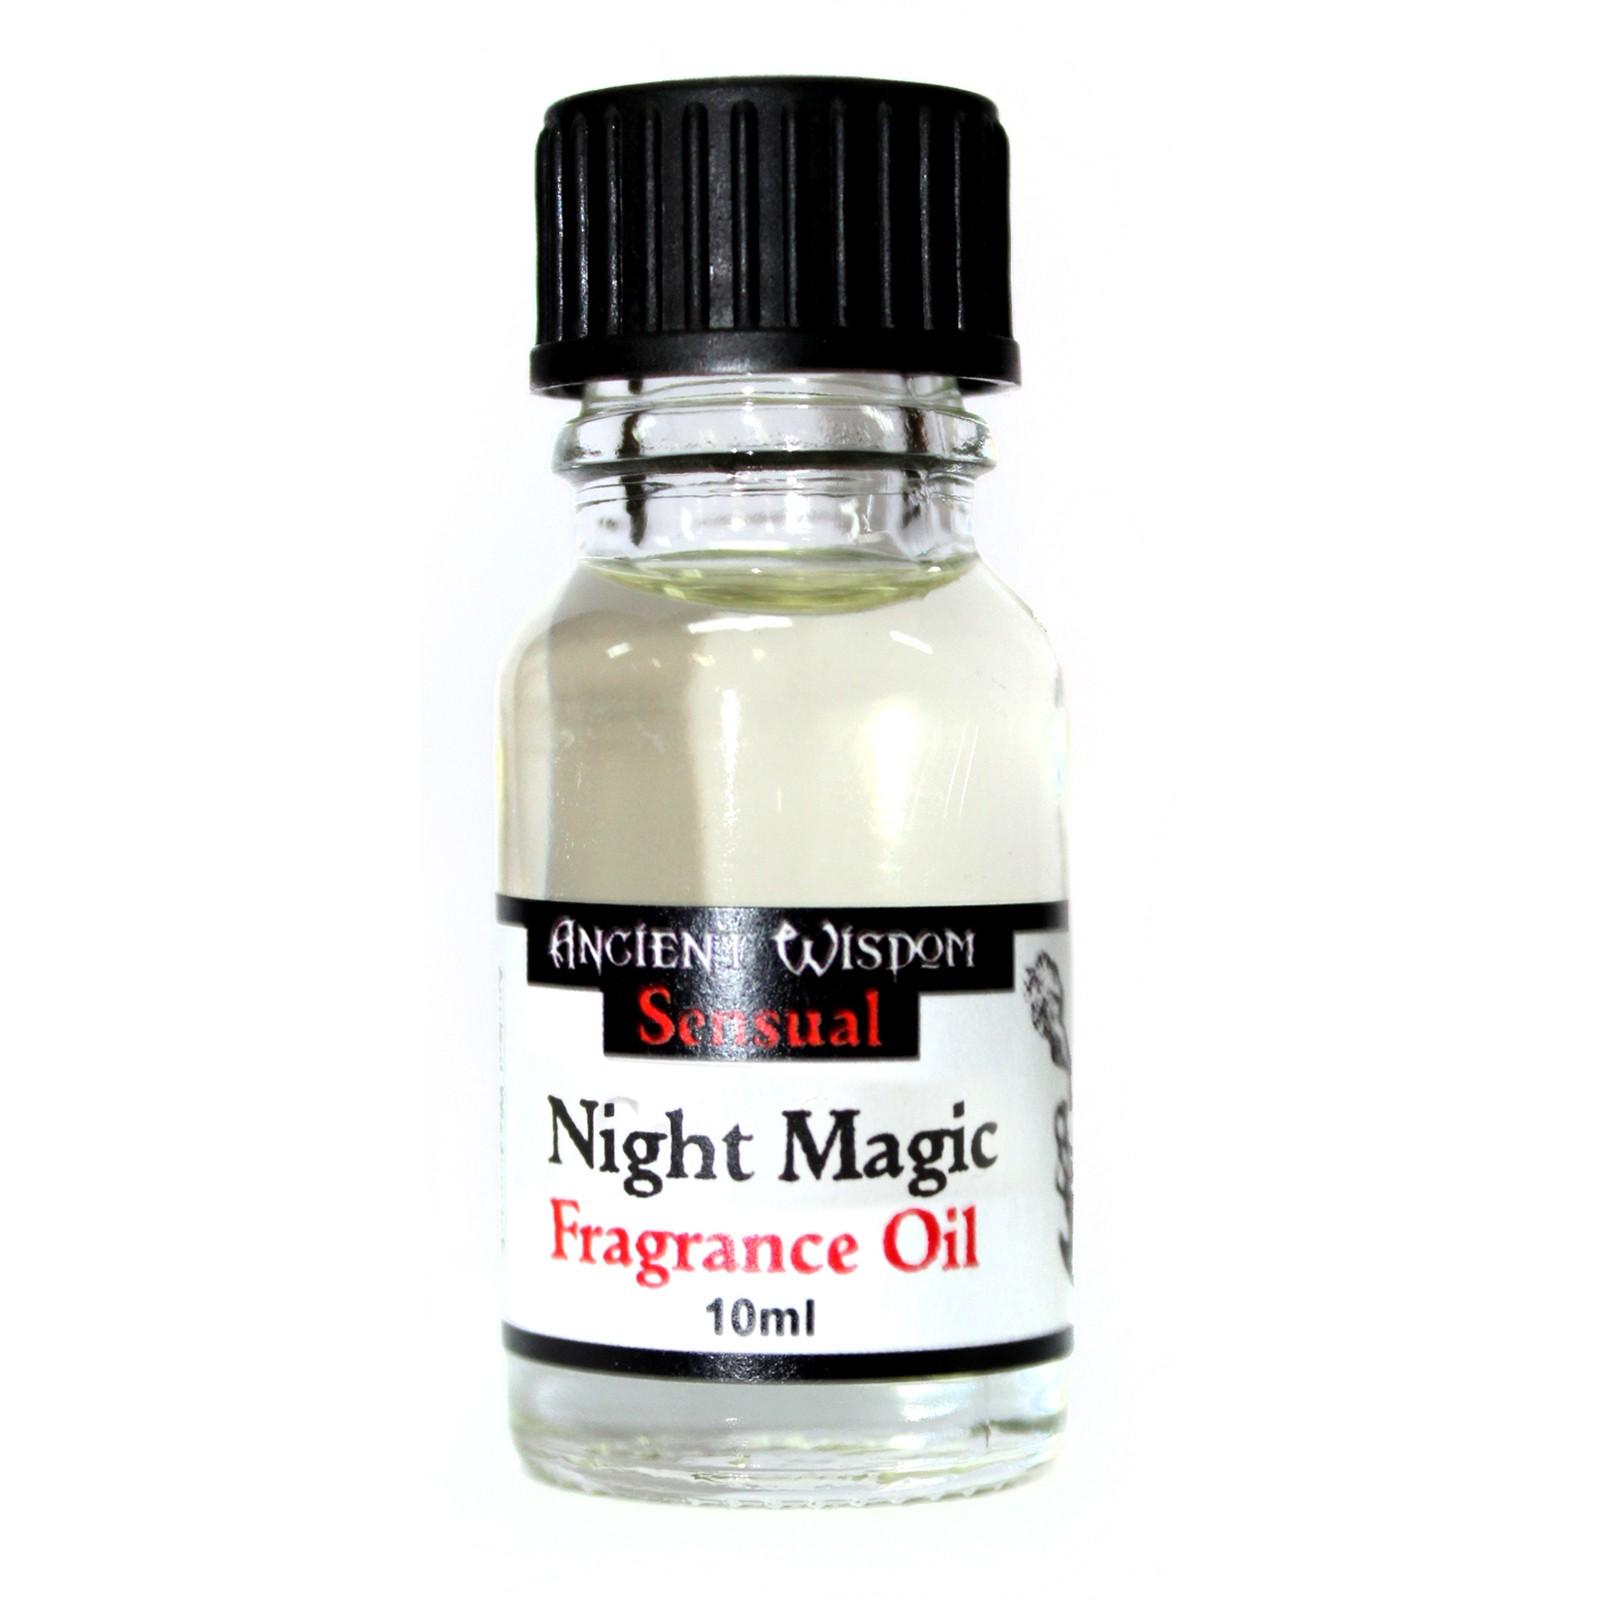 10ml Night Magic Fragrance Oil